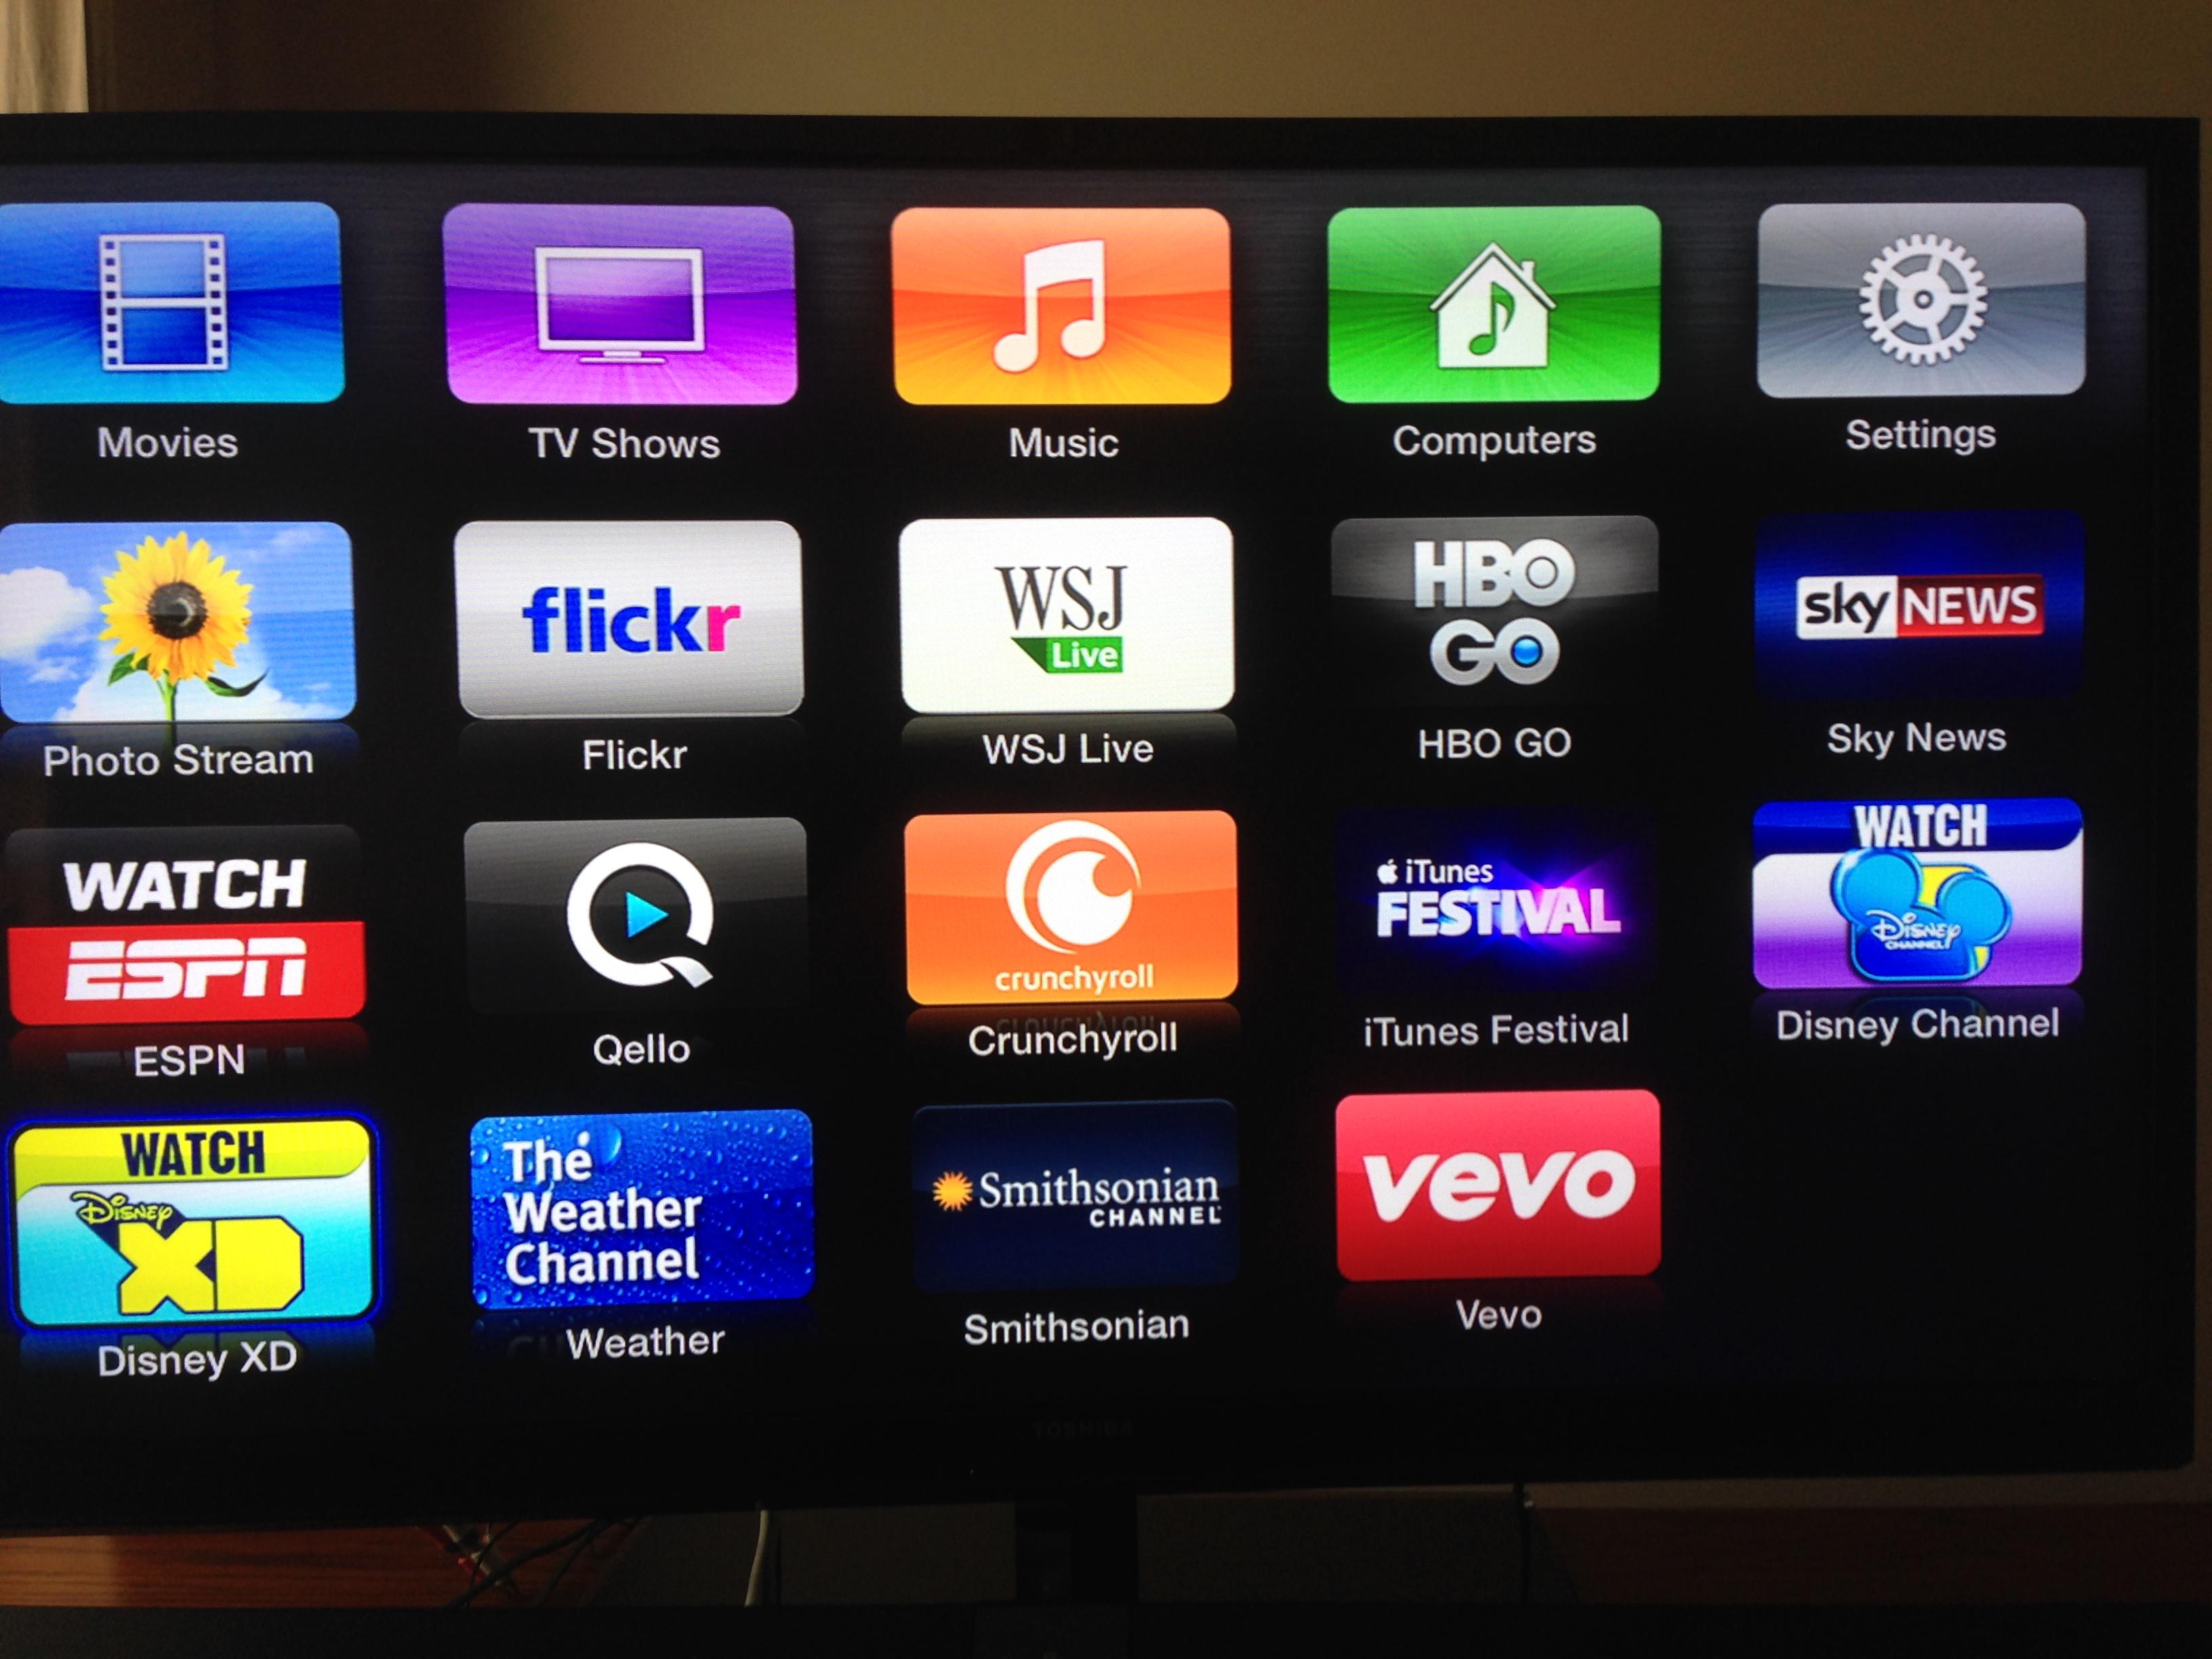 apple tv gains vevo  disney channel hd  disney xd  weather